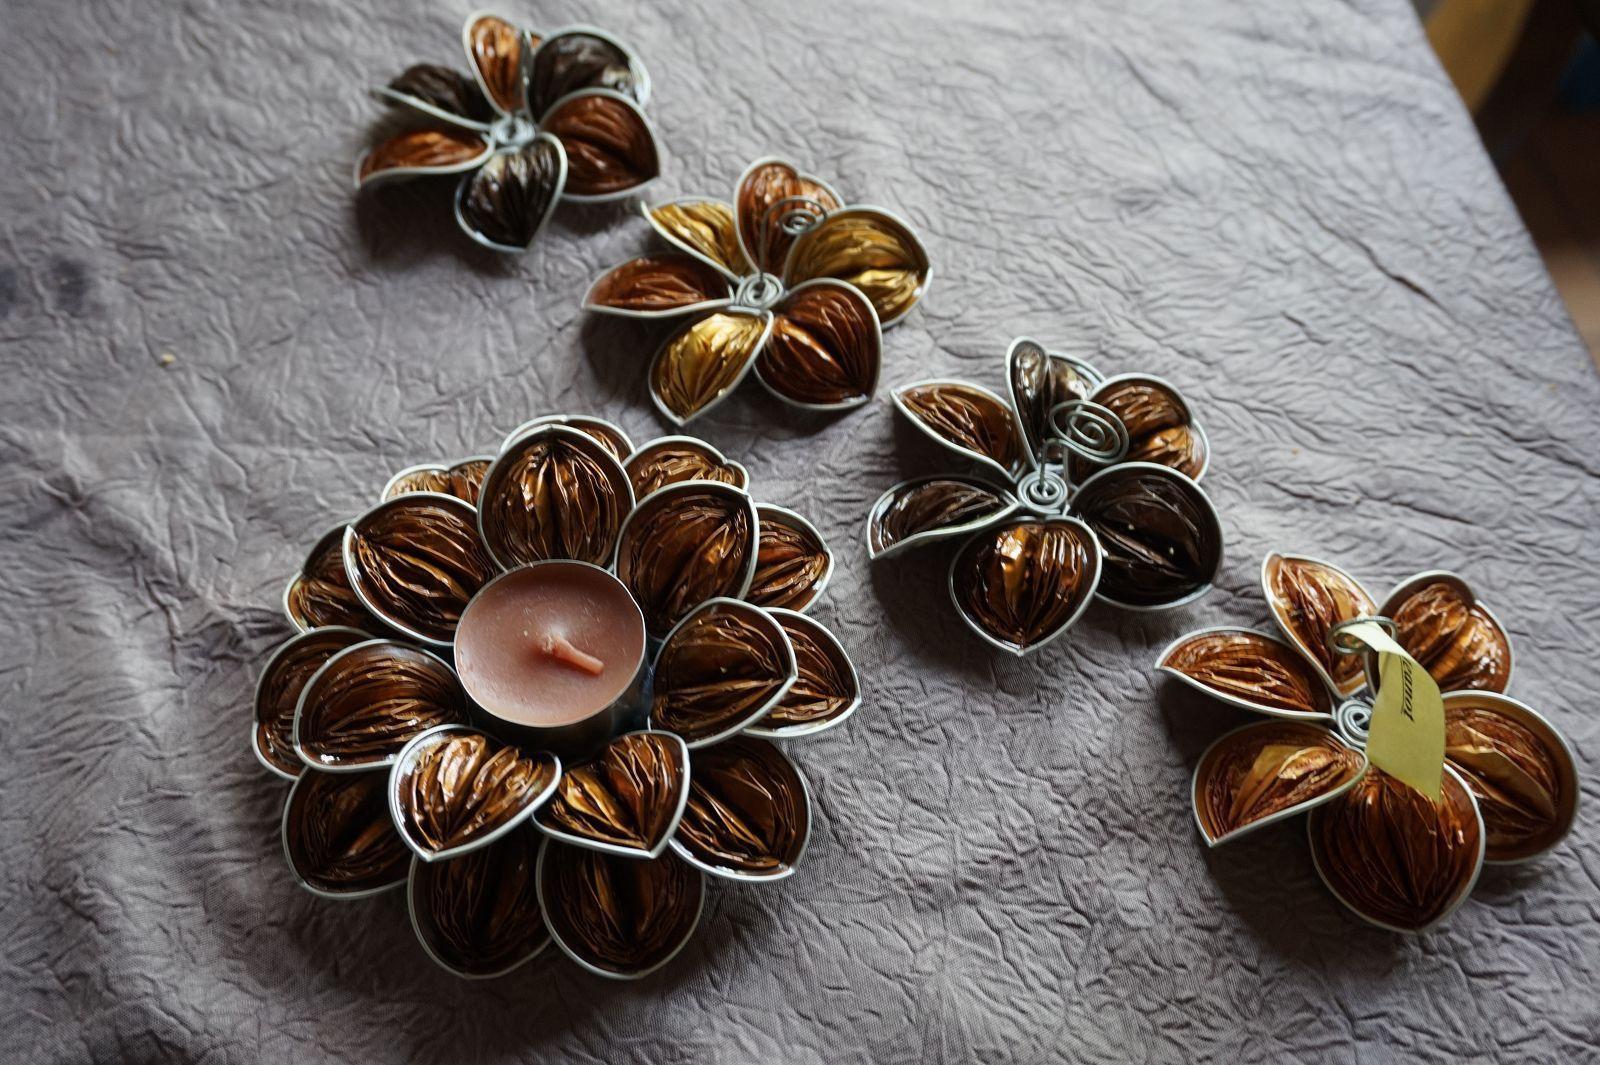 marque place bougeoir centre de table fleur capsules caf nespresso original noel dor or. Black Bedroom Furniture Sets. Home Design Ideas